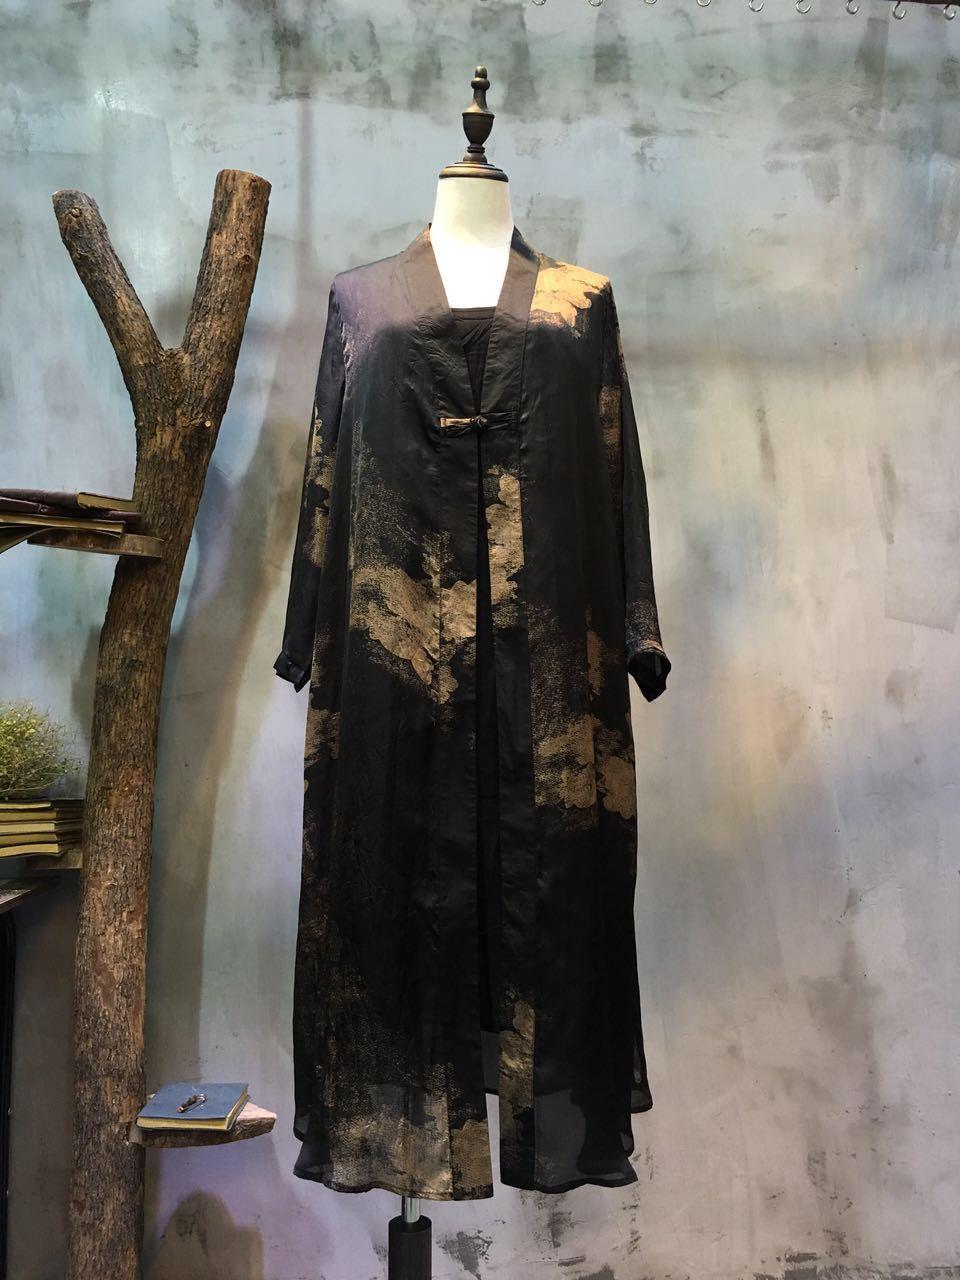 Ladylike Chinese Ink Painting Loose Cardigan Long Chiffon Clothes  #cardigan #black #chiffon #clothes #outerwear #Chinese #ink #painting #print #long #elegant